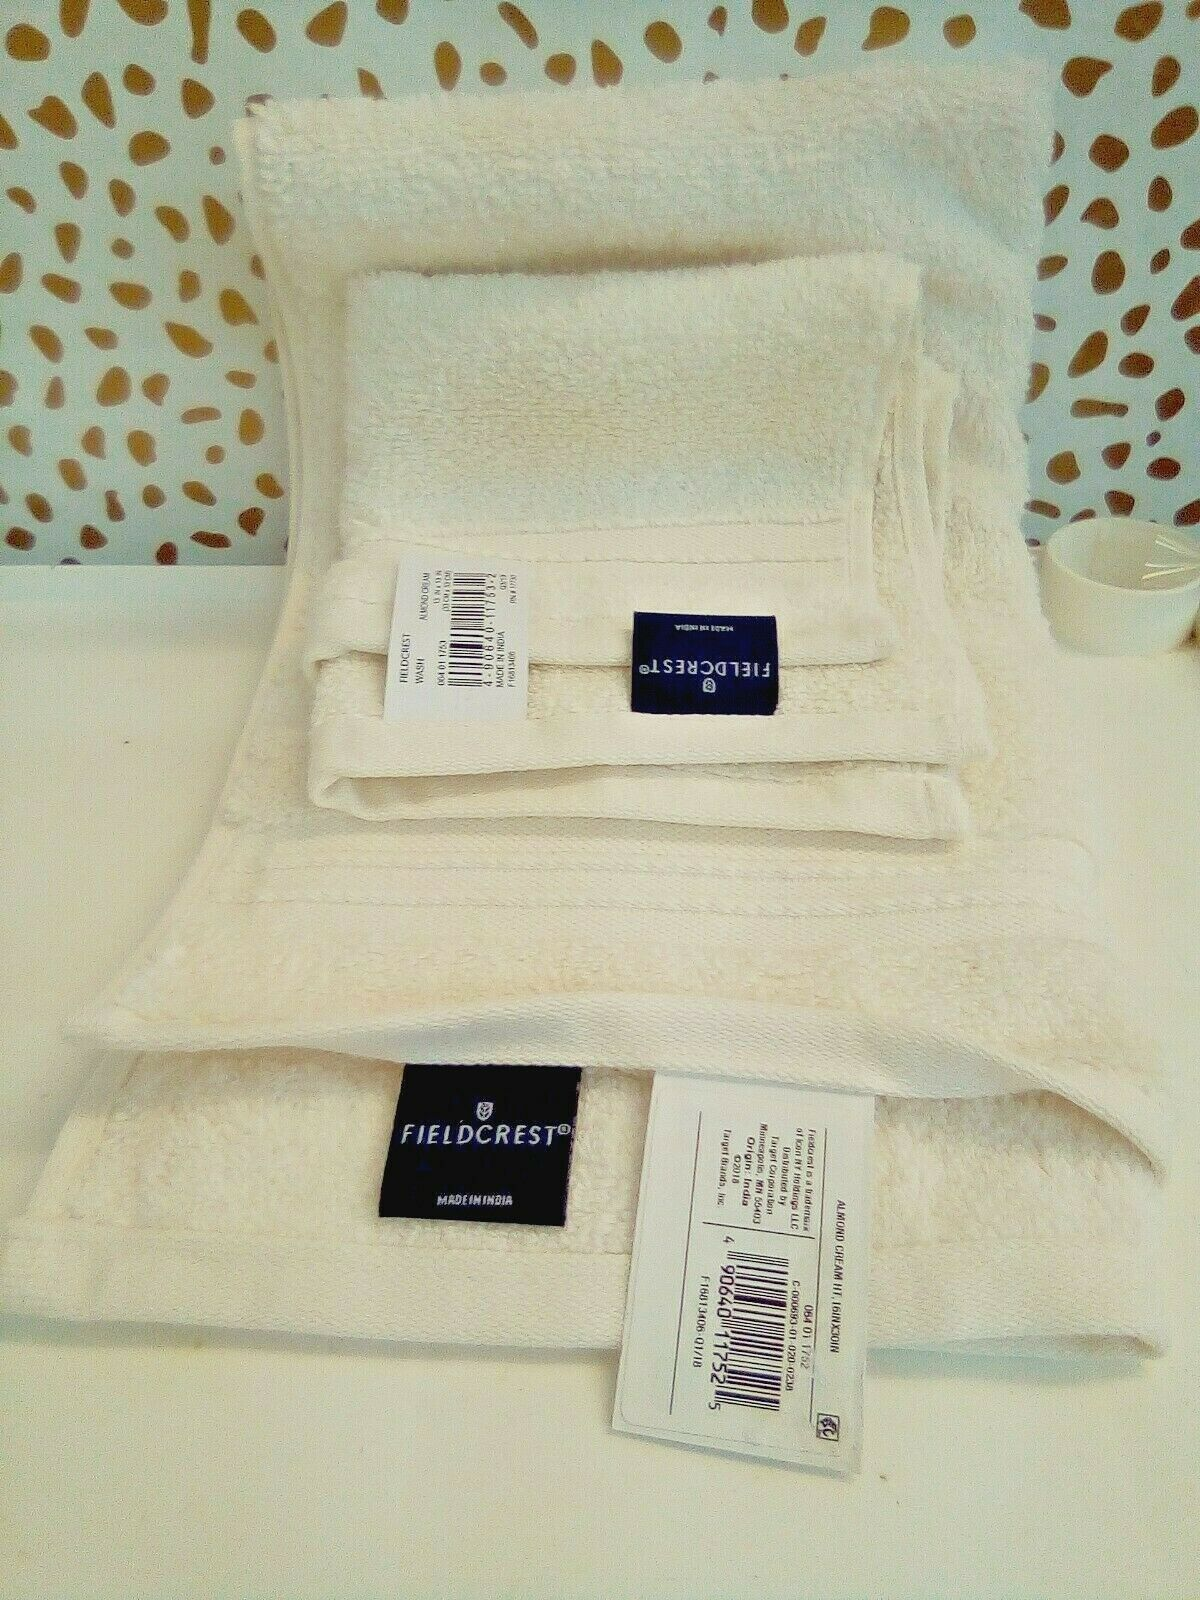 FIELDCREST 2Pc  Towel Set 100%Cotton 1 HAND Towel & 1 Washcloth -ALMOND CREAM-